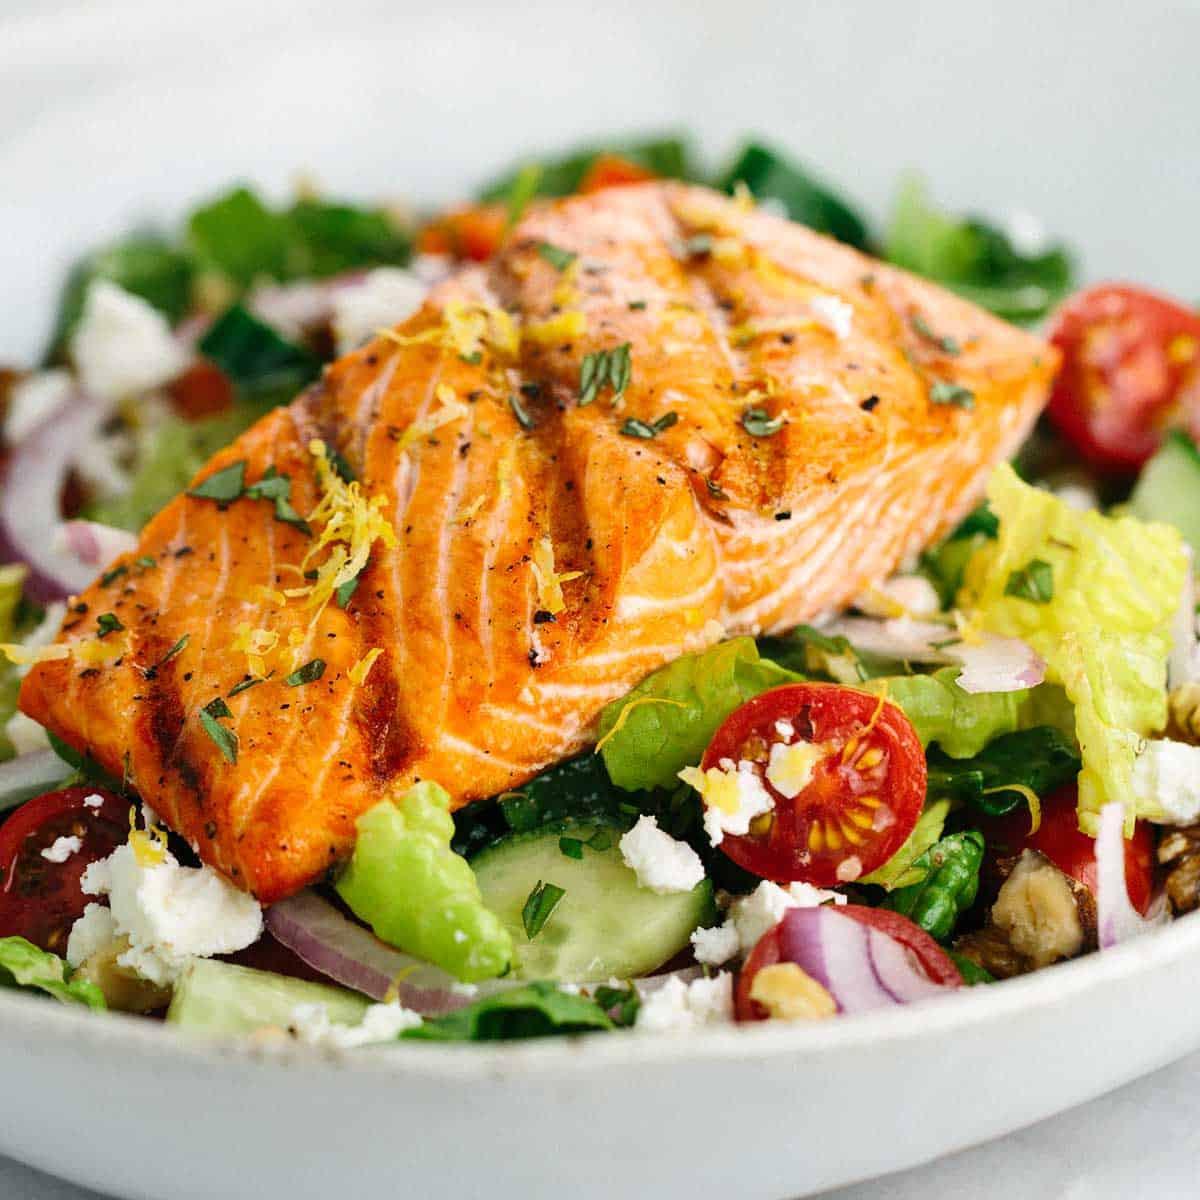 Salad With Salmon  Grilled Salmon Greek Salad with Lemon Basil Dressing